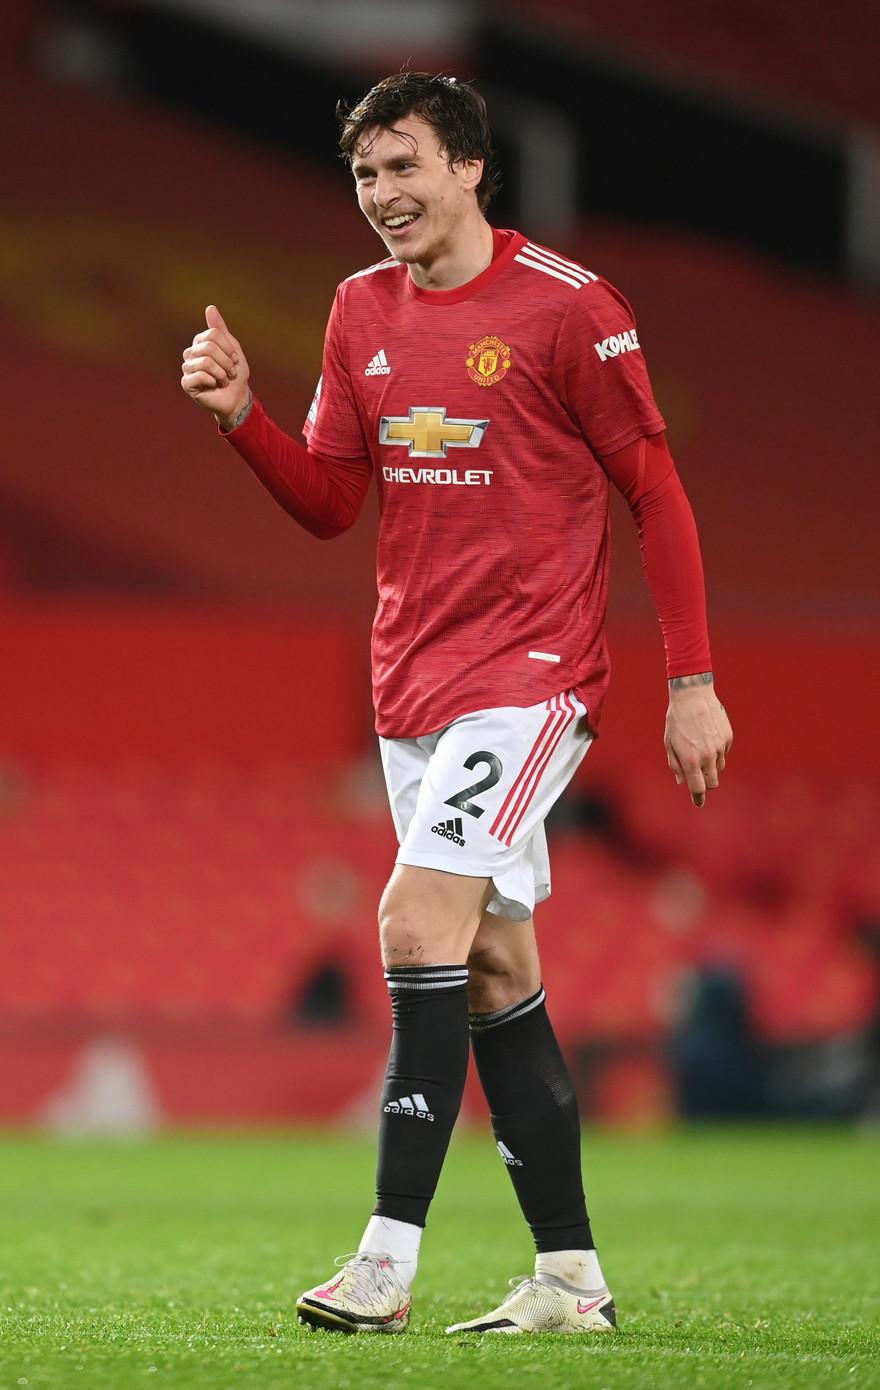 <p>10) Lindelof - Manchester United: 4142'</p>